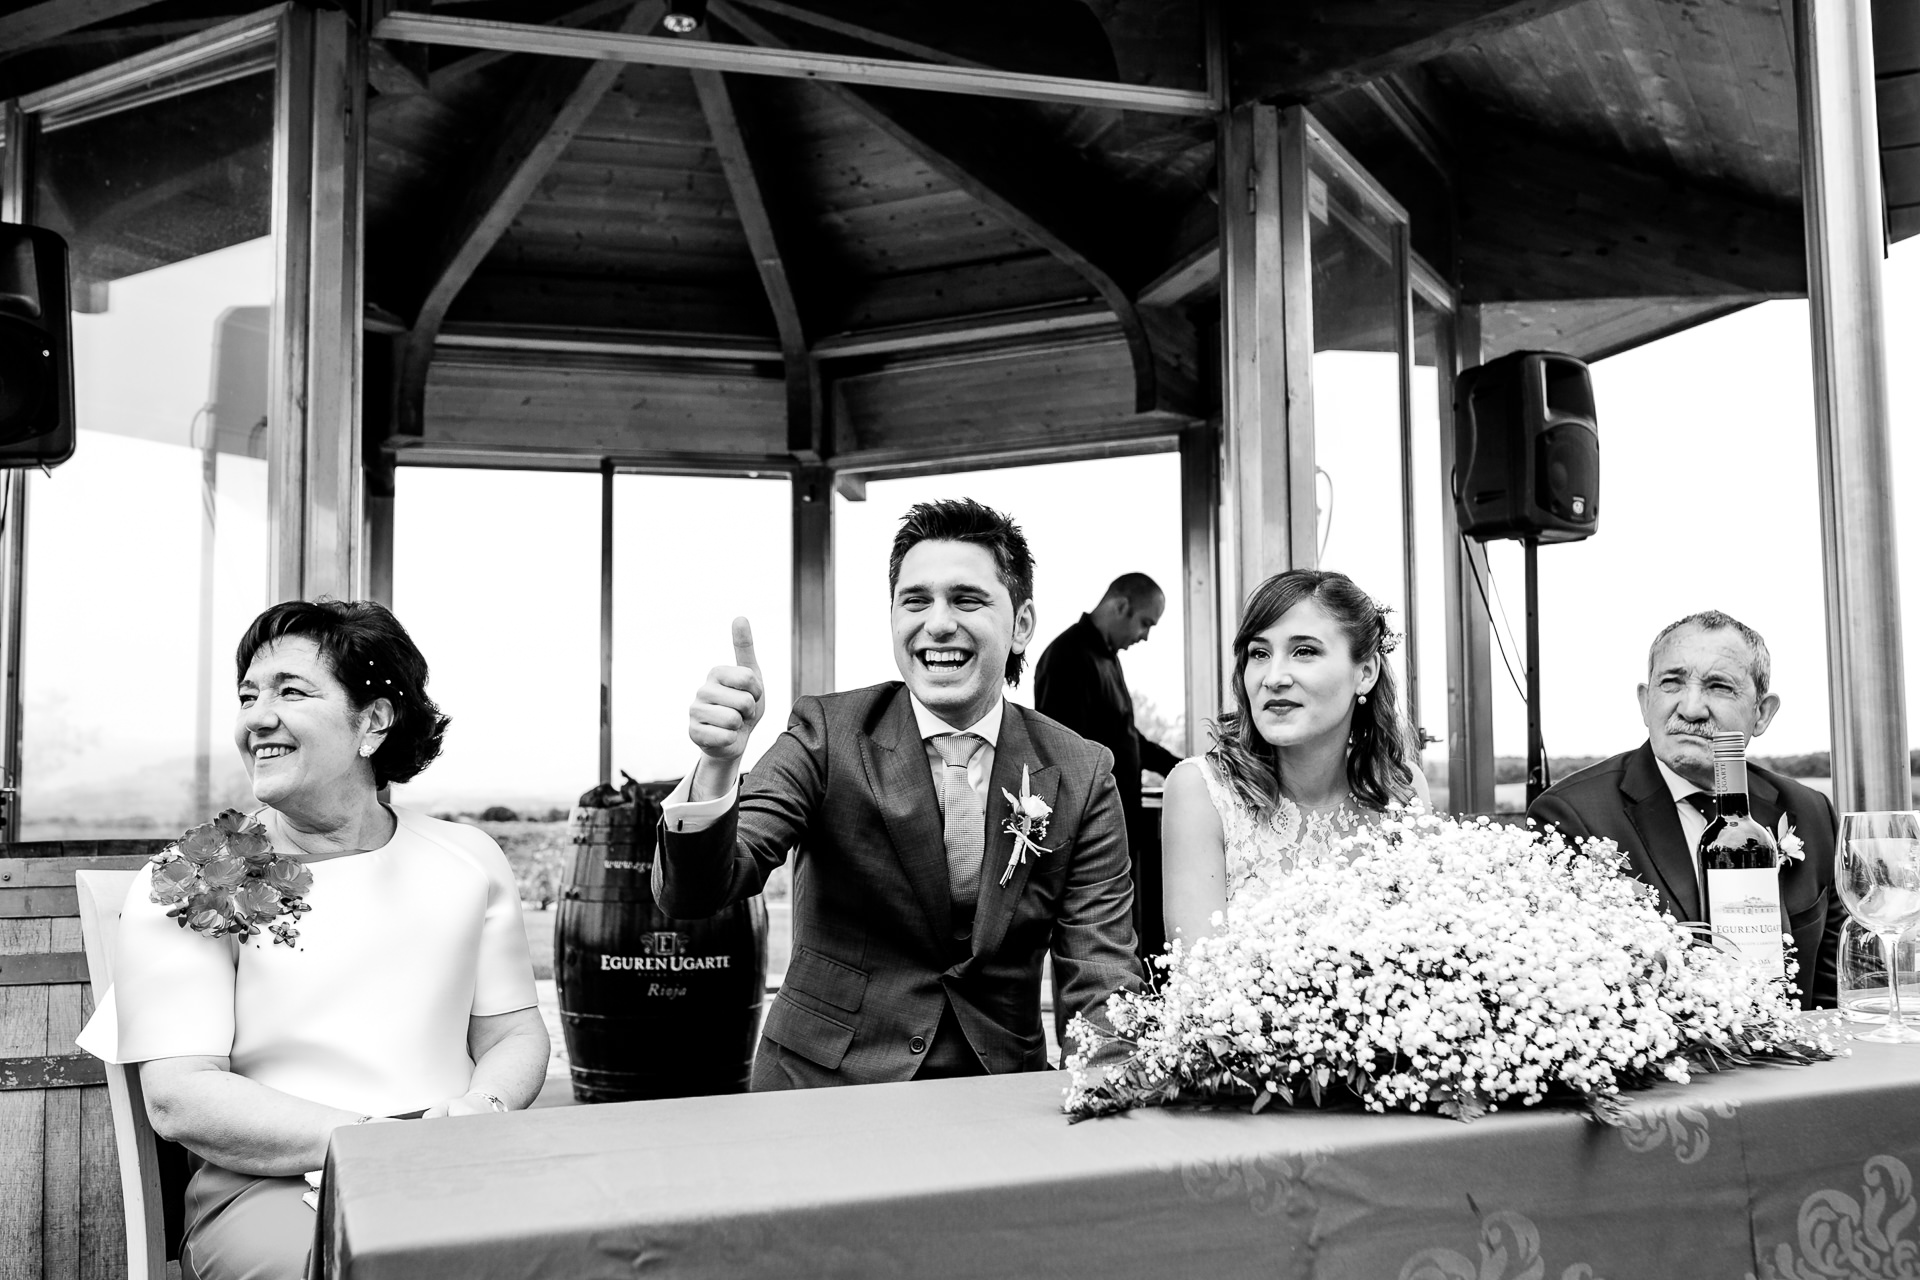 boda civil eguren ugarte la rioja 132840